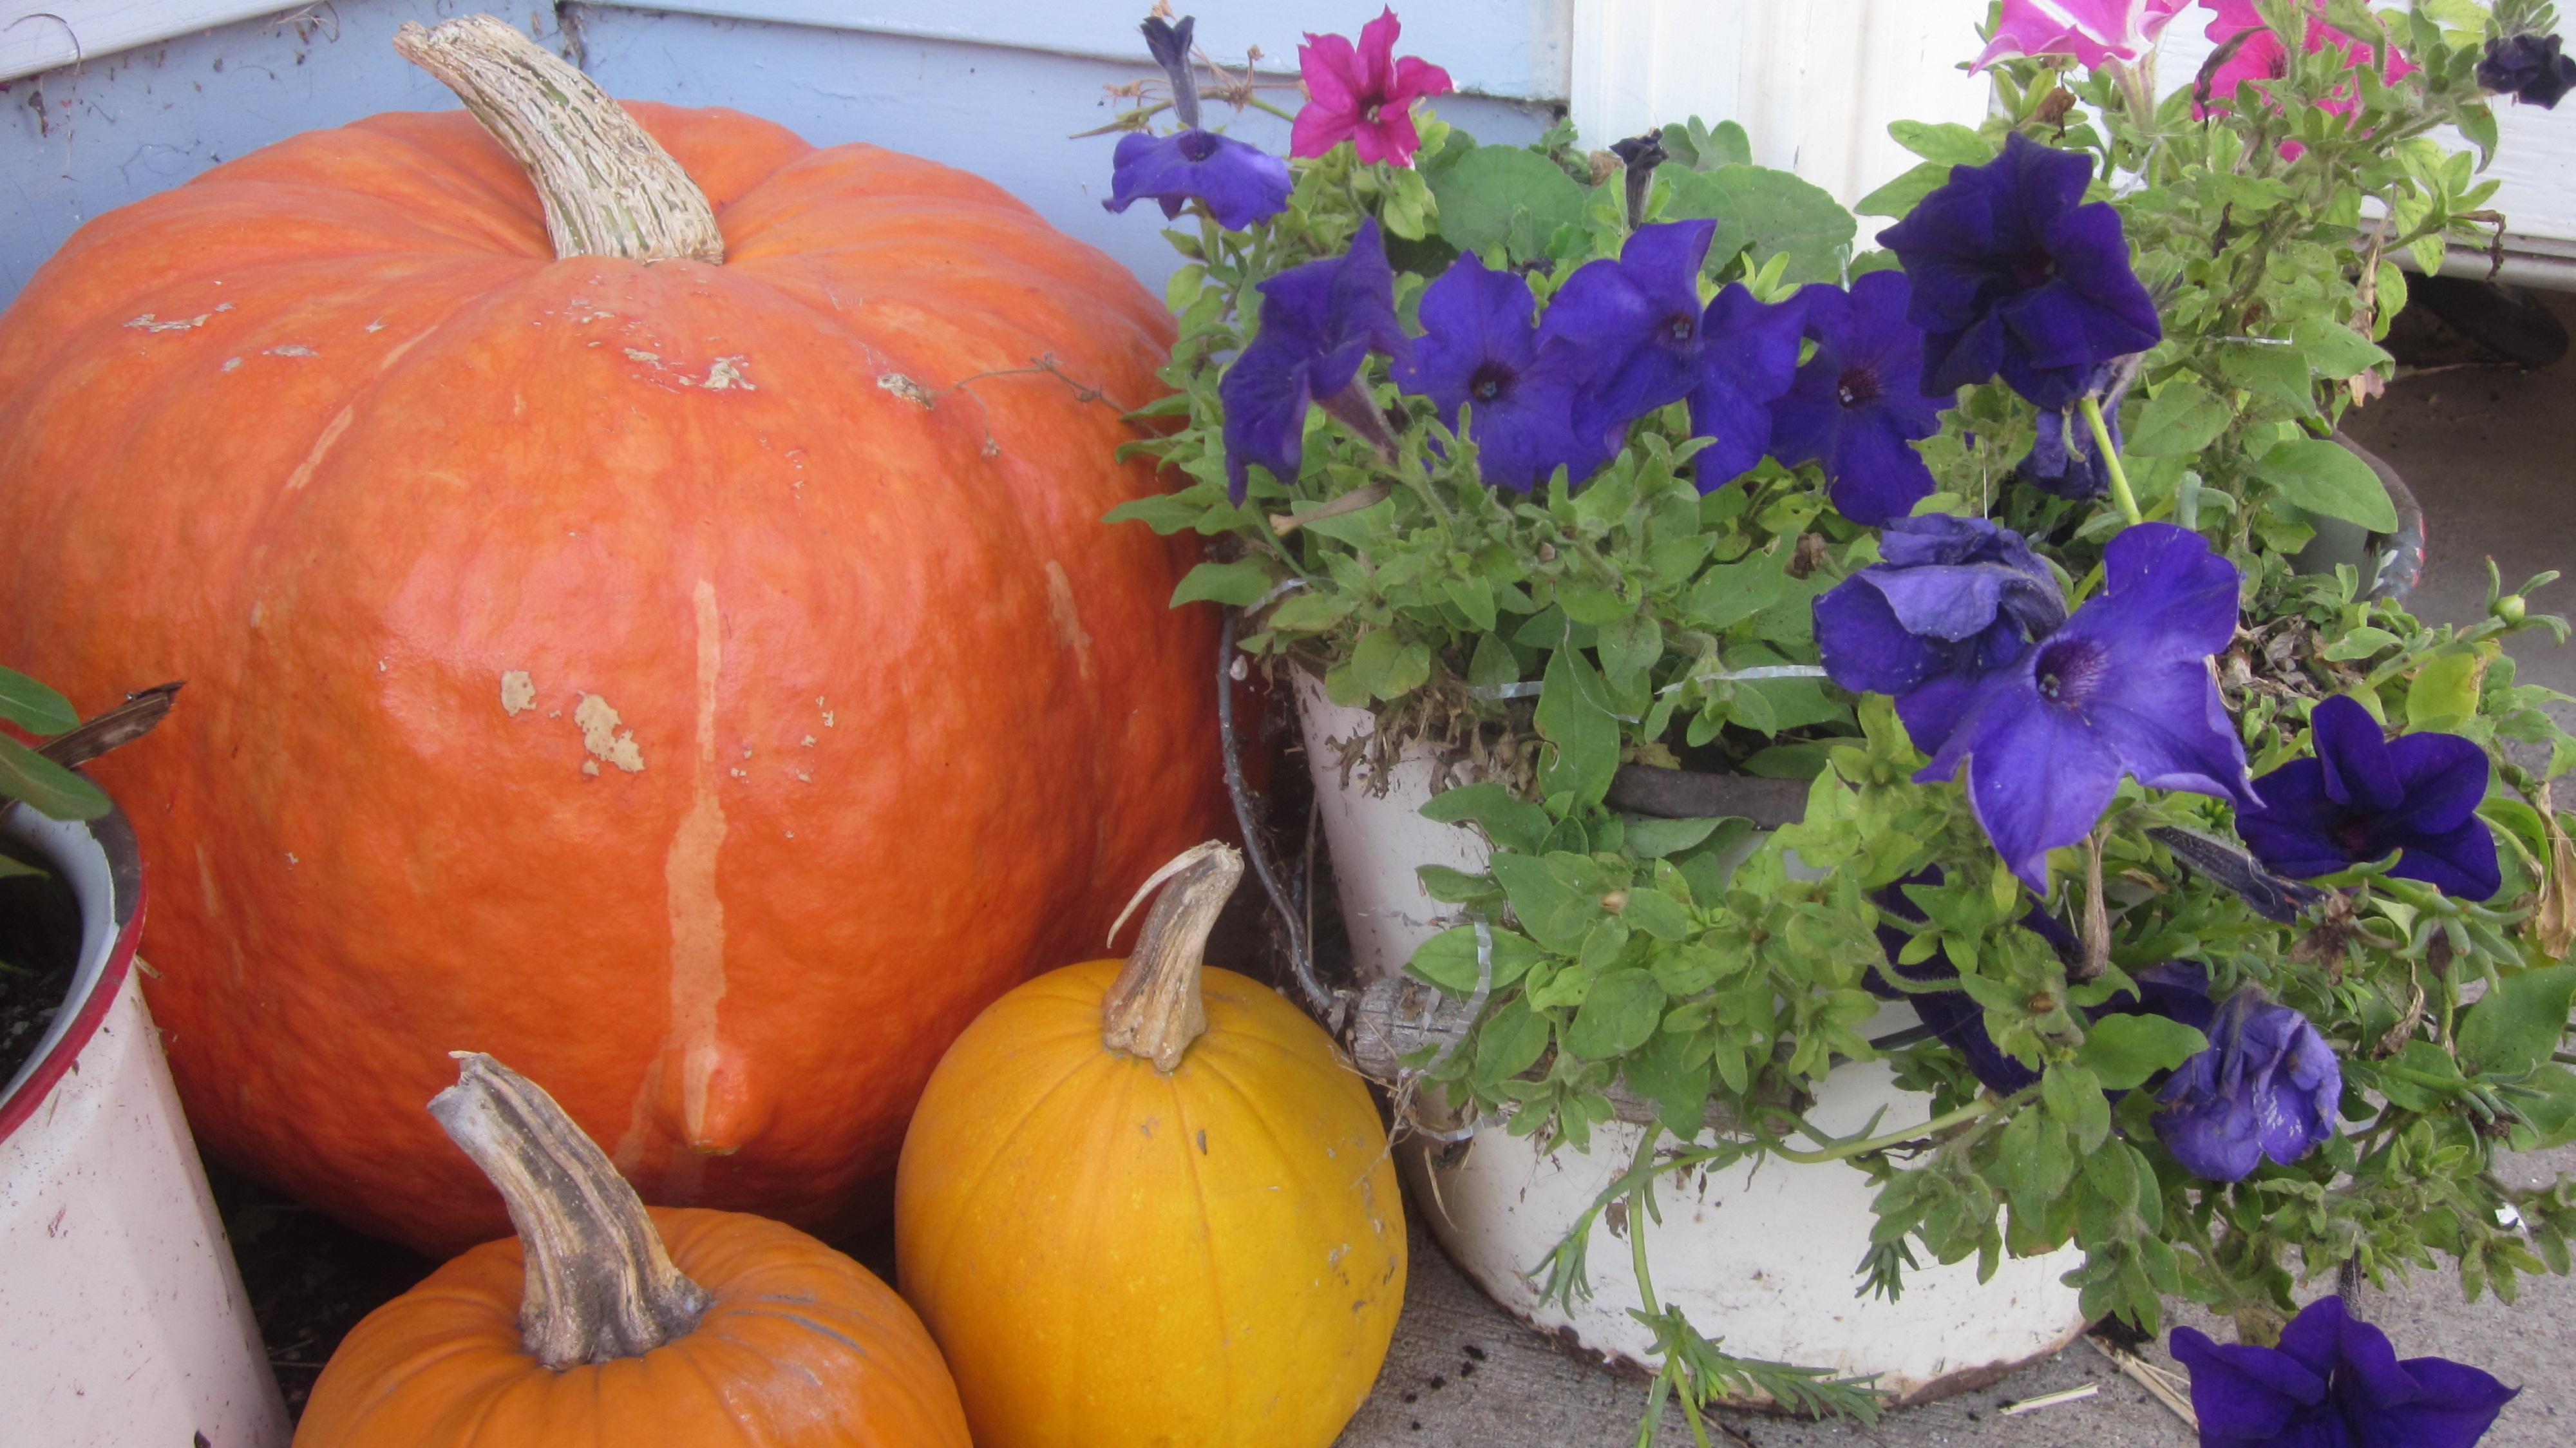 Some pumpkin tomfoolery